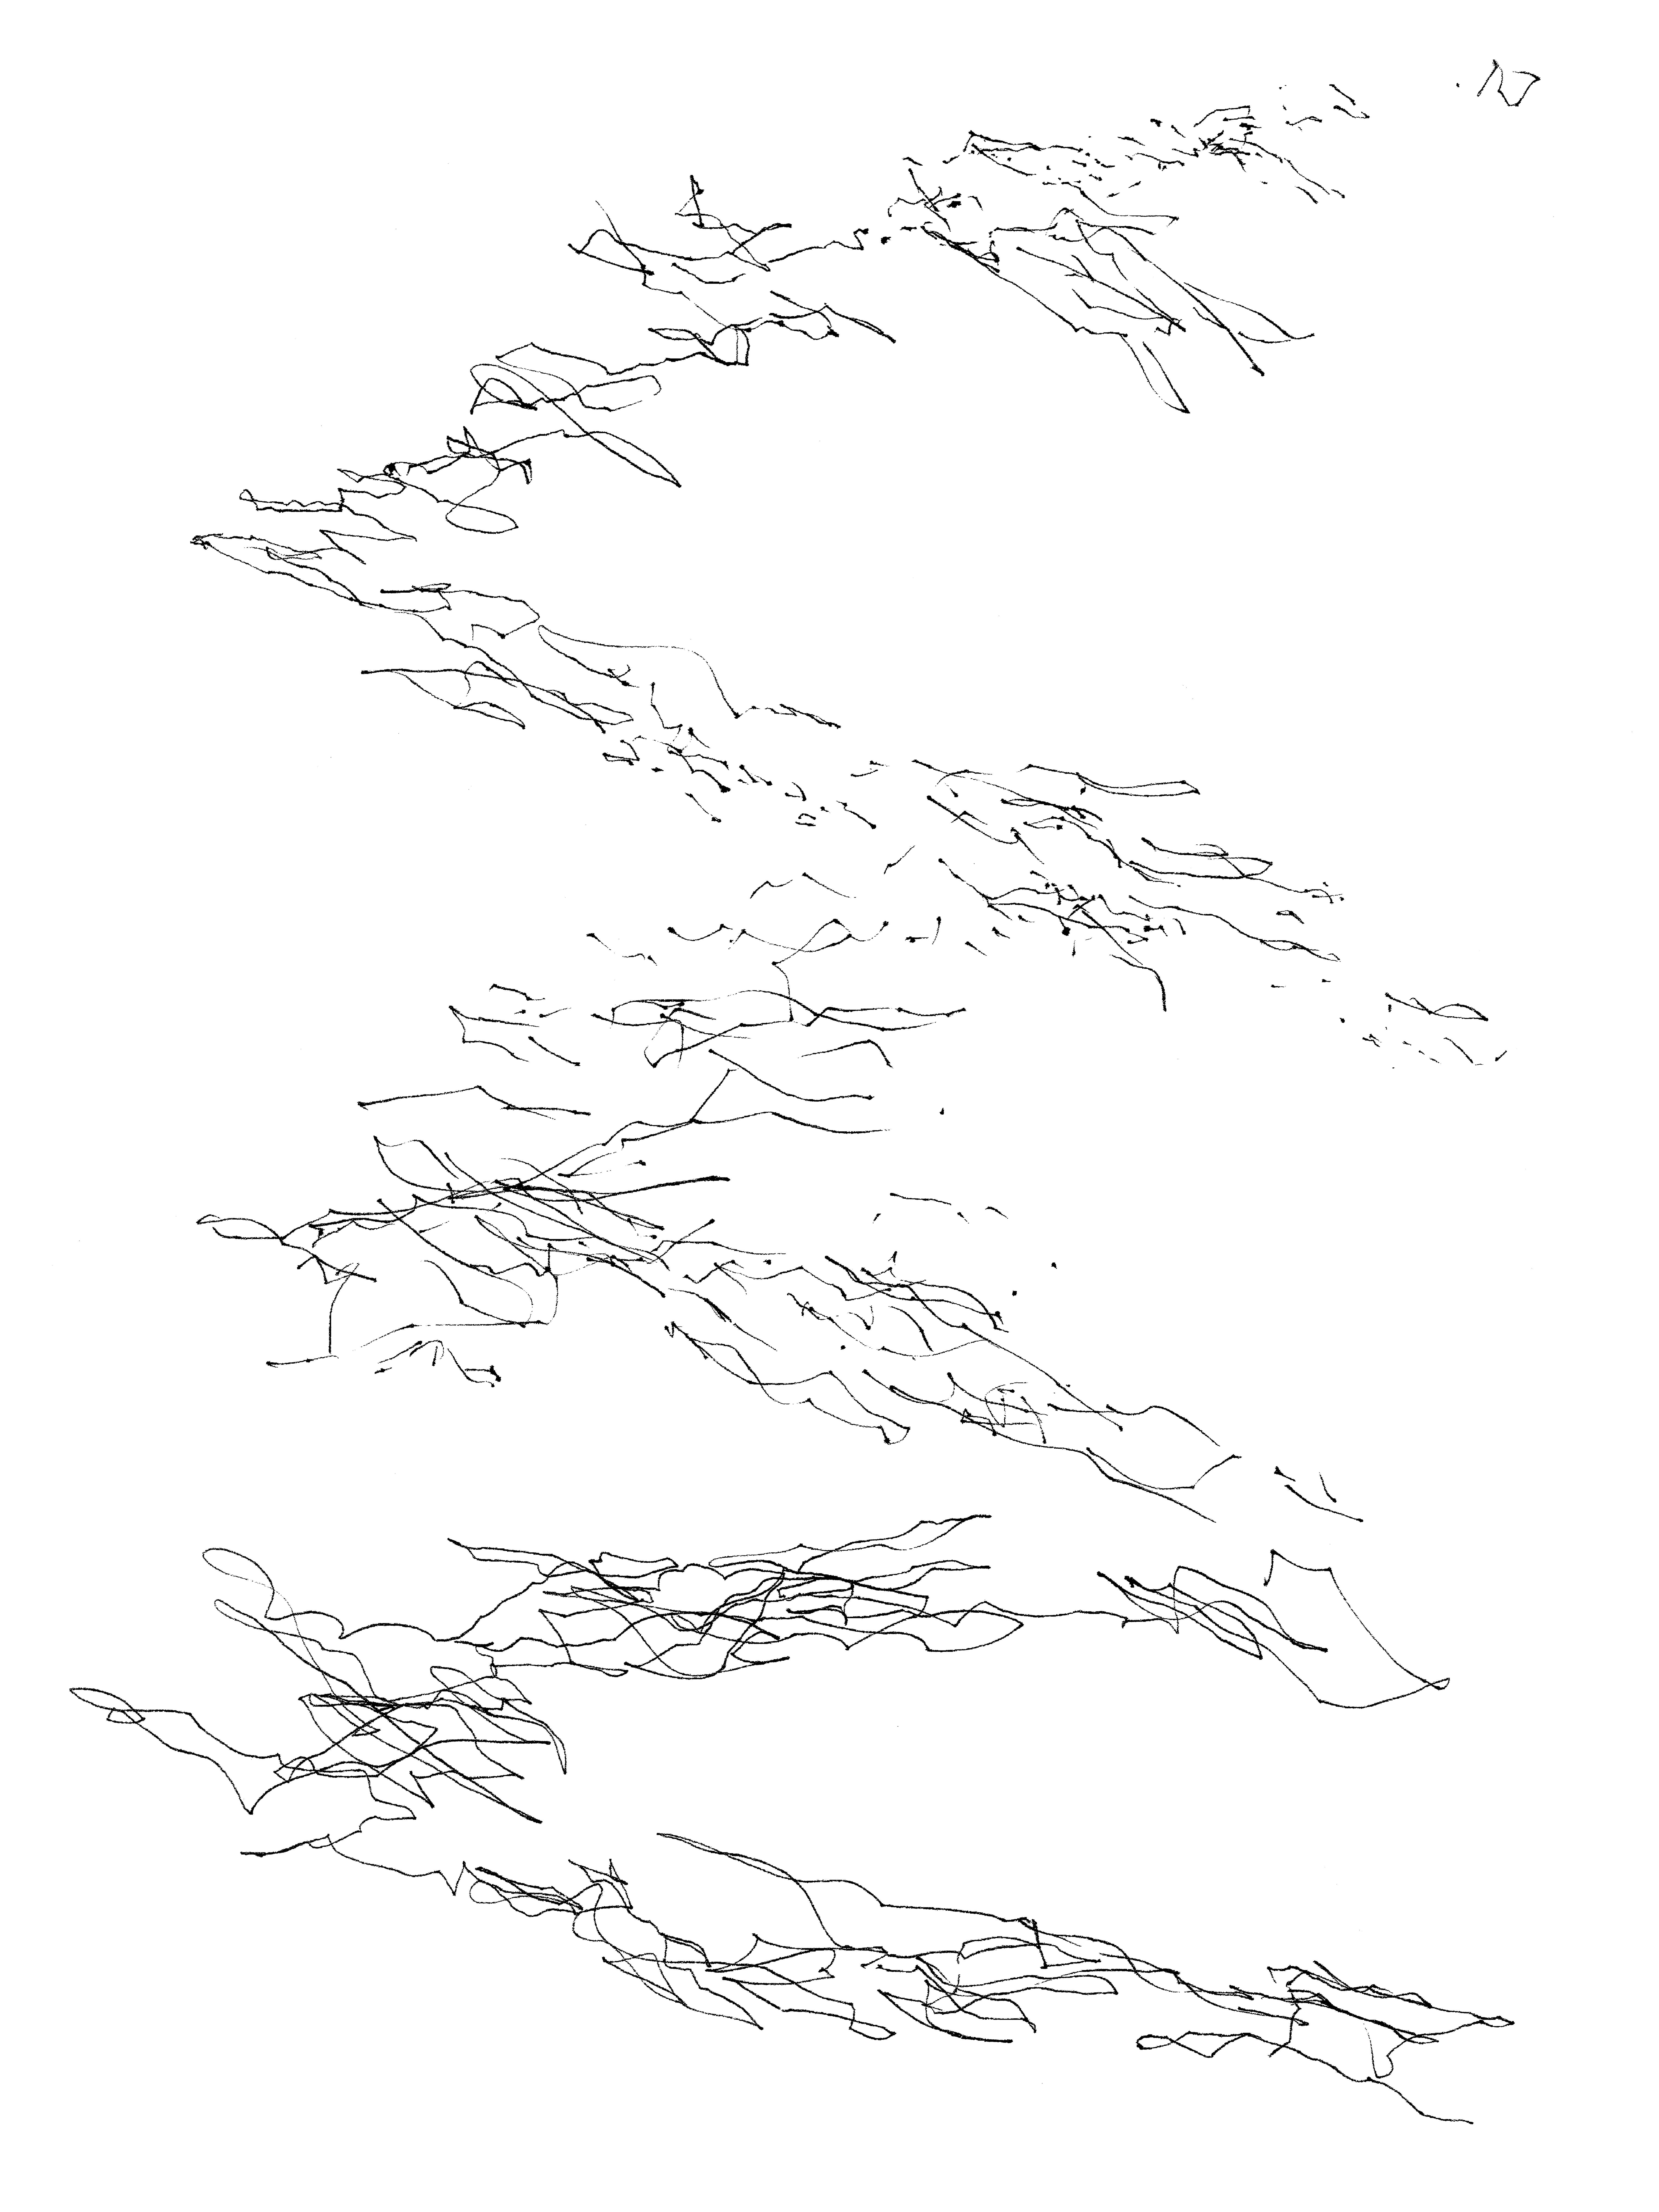 Composite Tryptych Bottom Final Greyscale